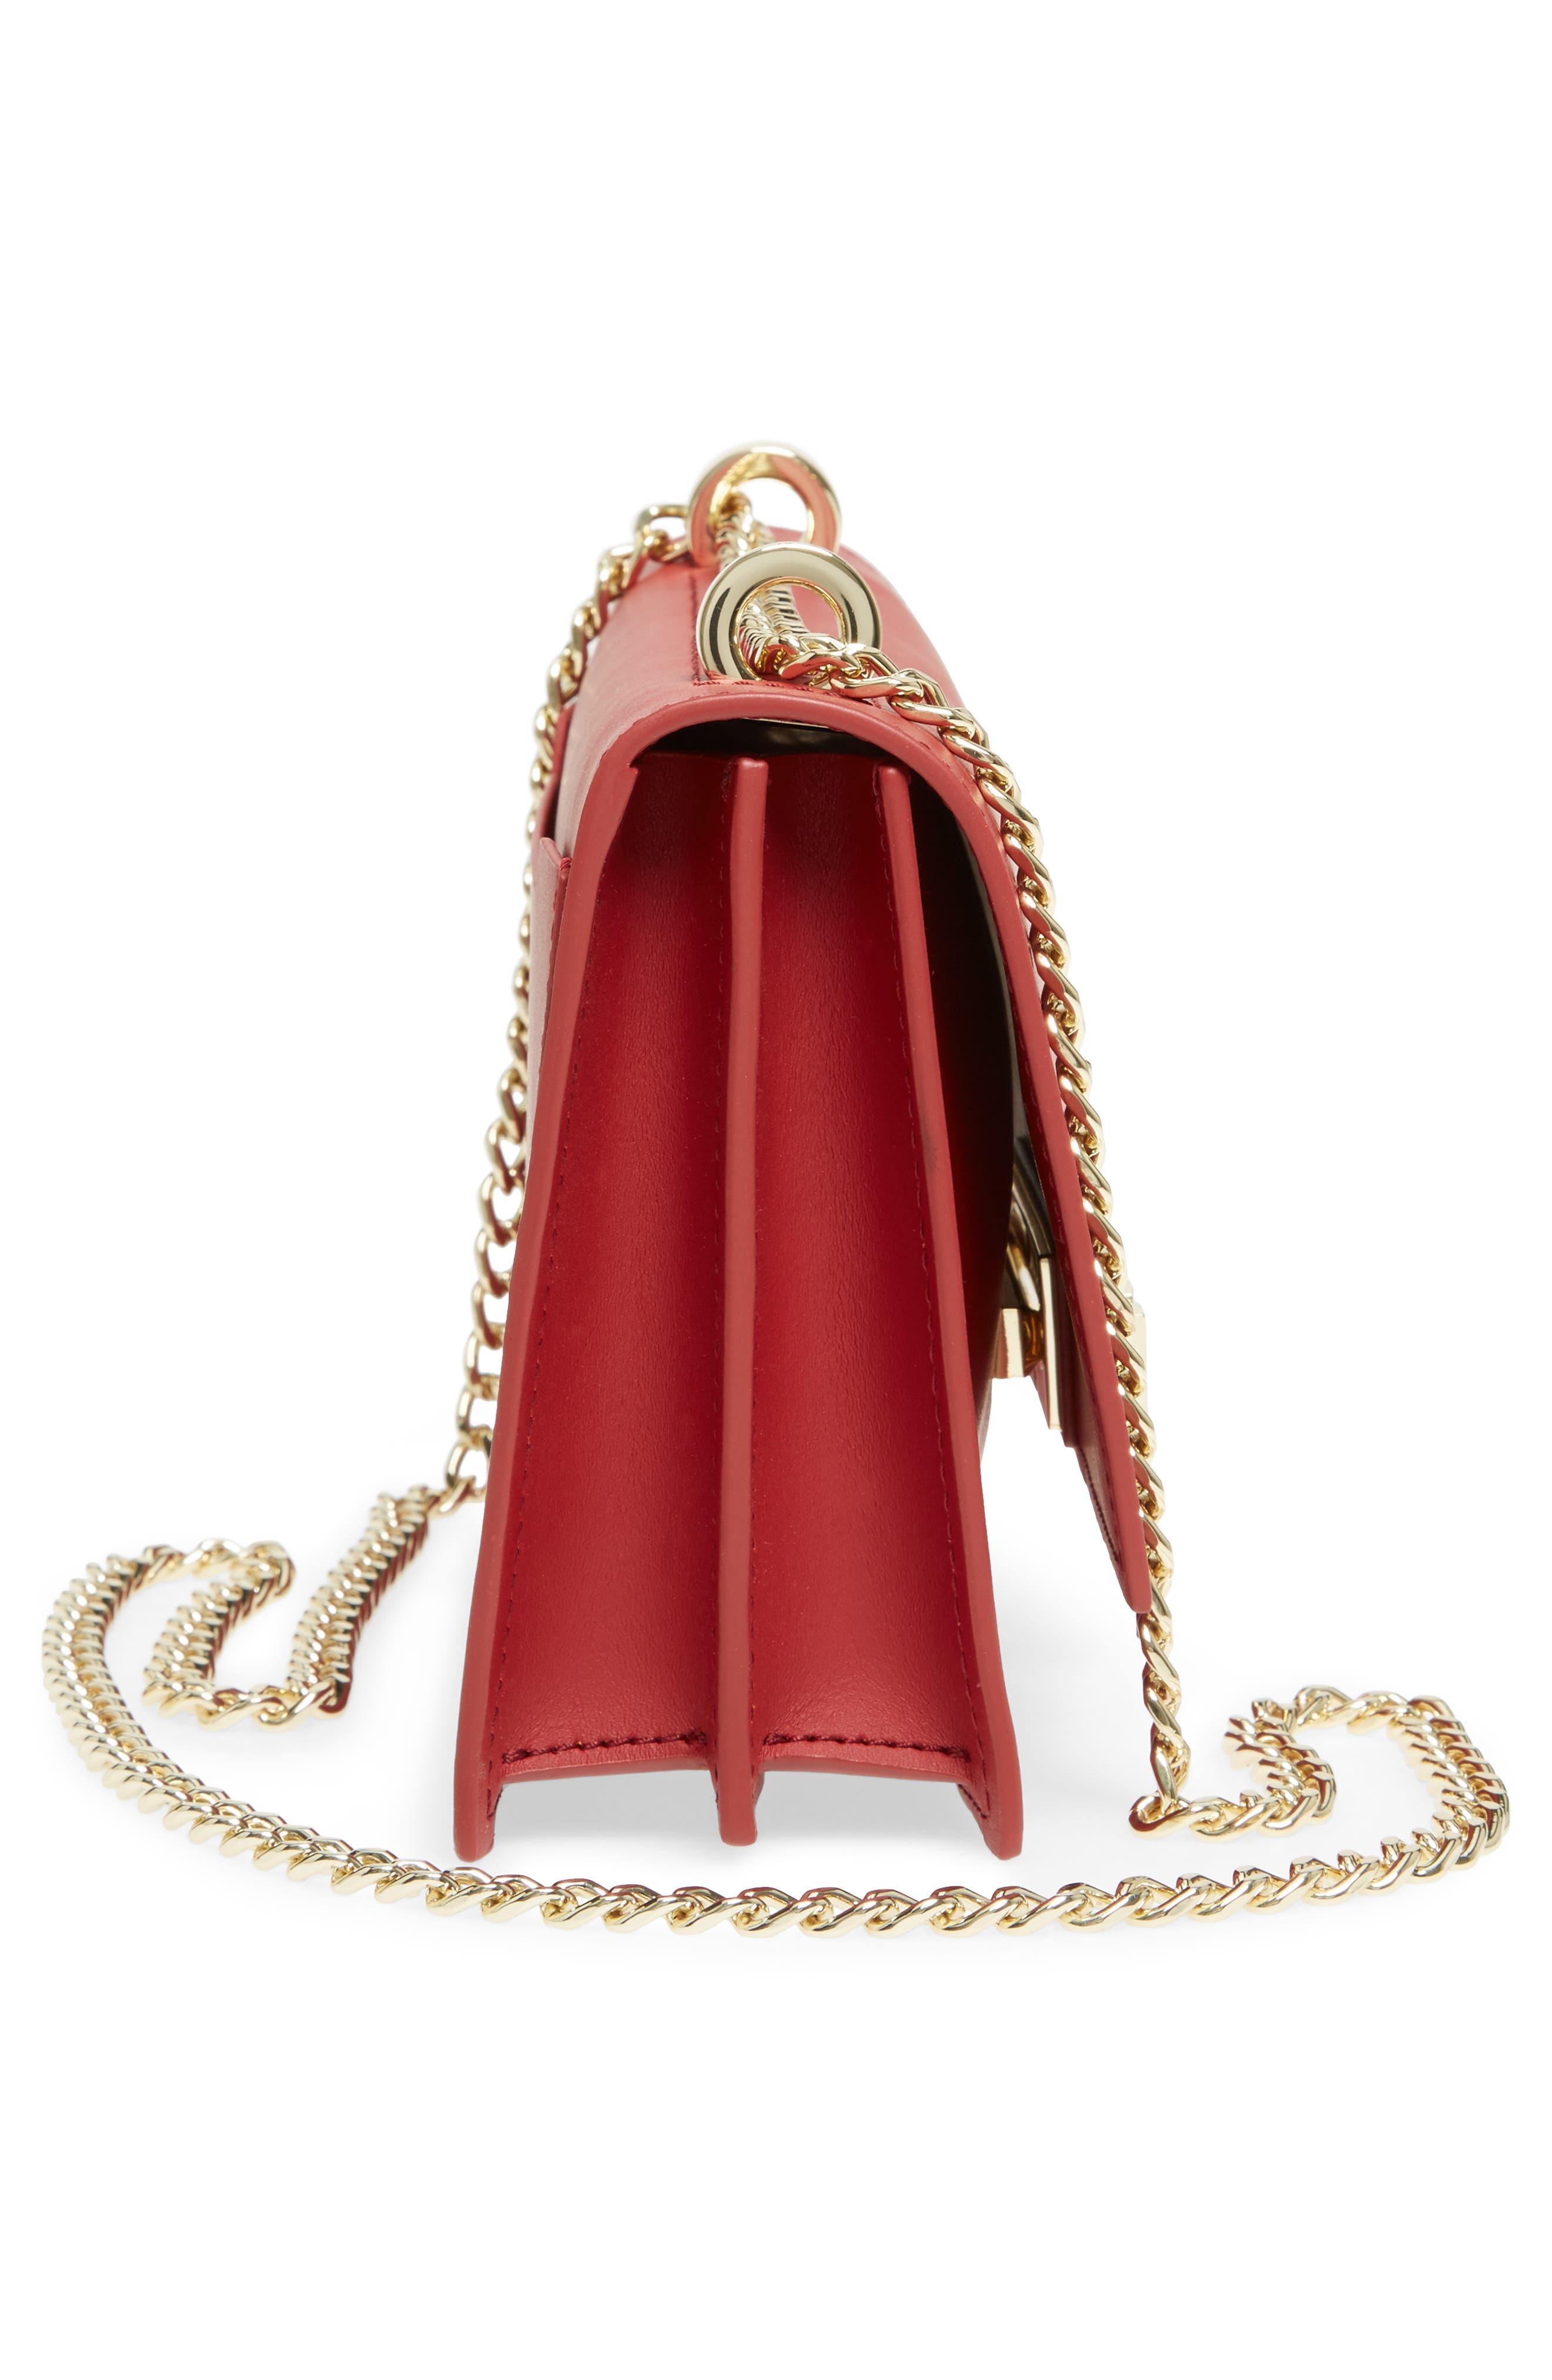 ZAC Zac Posen Earthette Leather Accordion Bag,                             Alternate thumbnail 5, color,                             Red